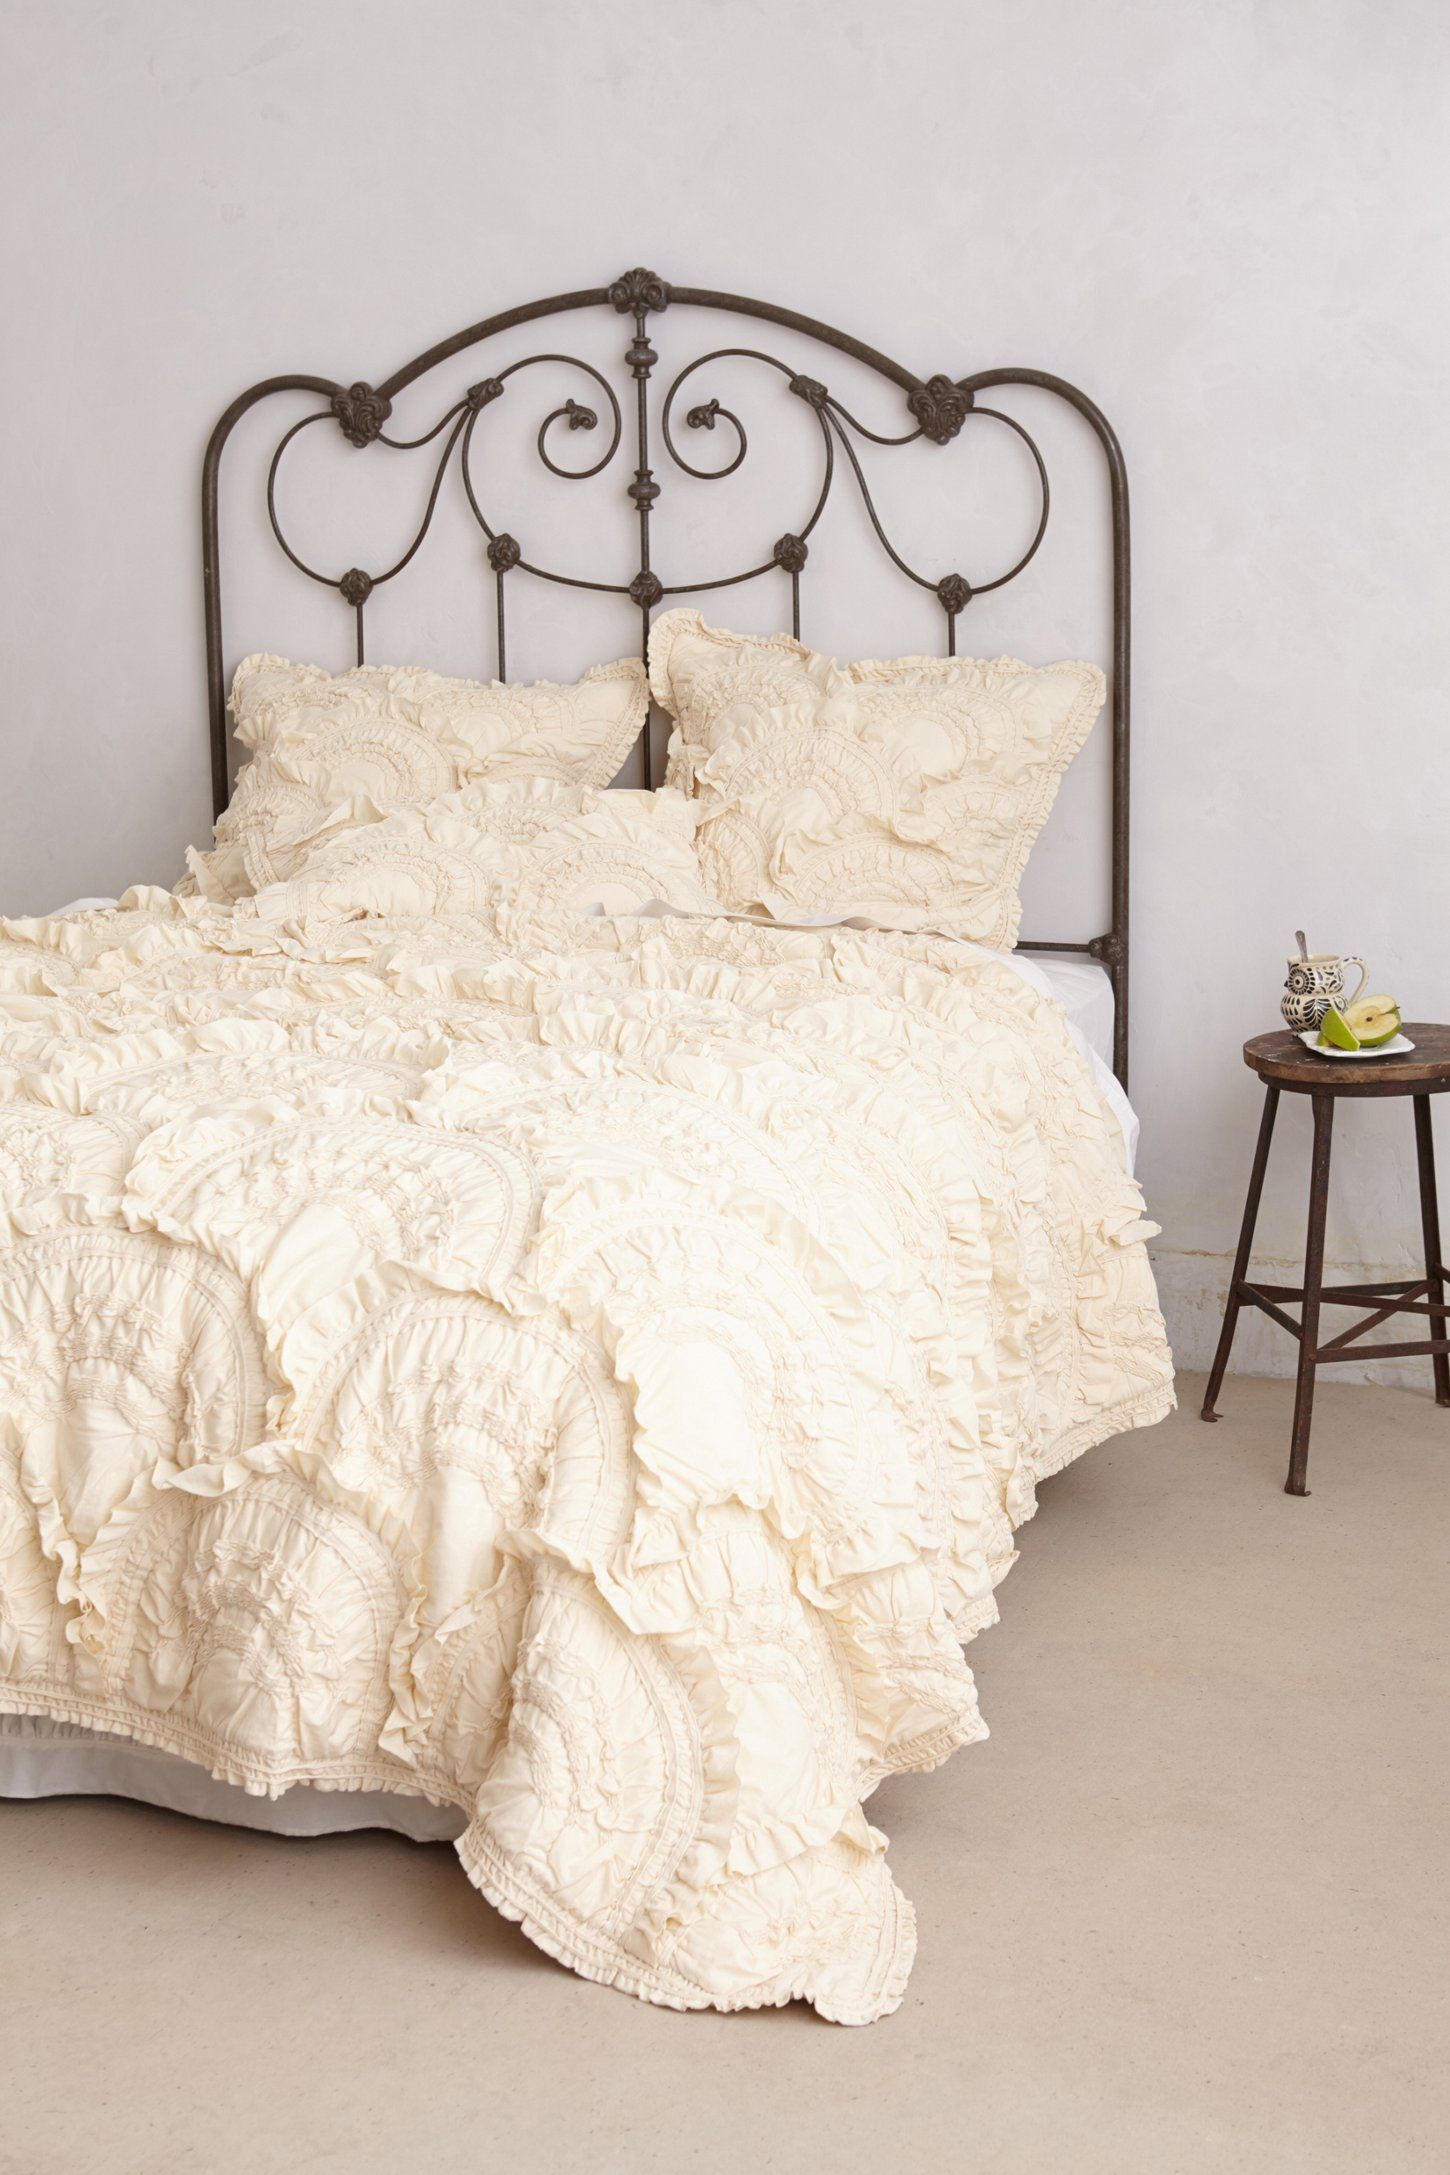 Anthropologie white bedroom - Bed Frames Rivulets Quilt From Anthropologie